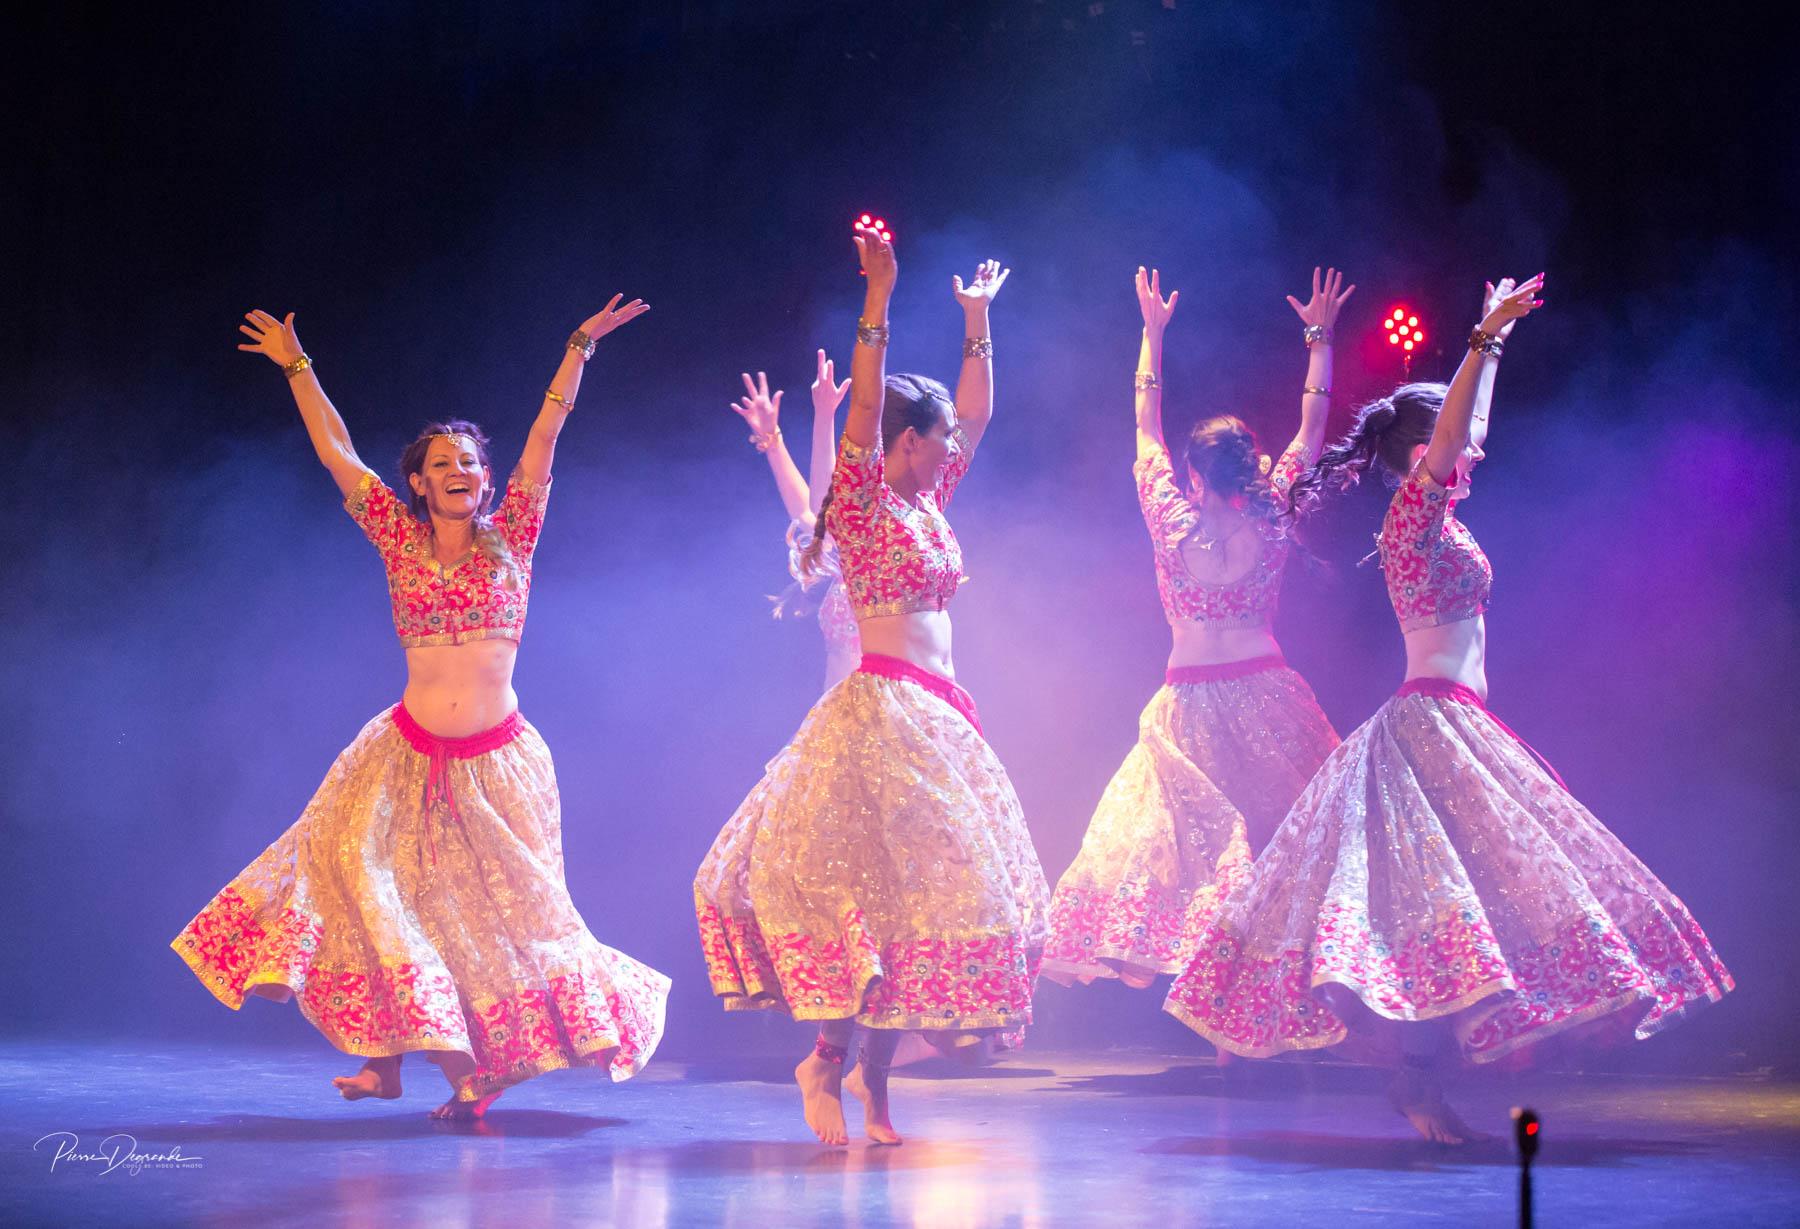 Nemyah dance company